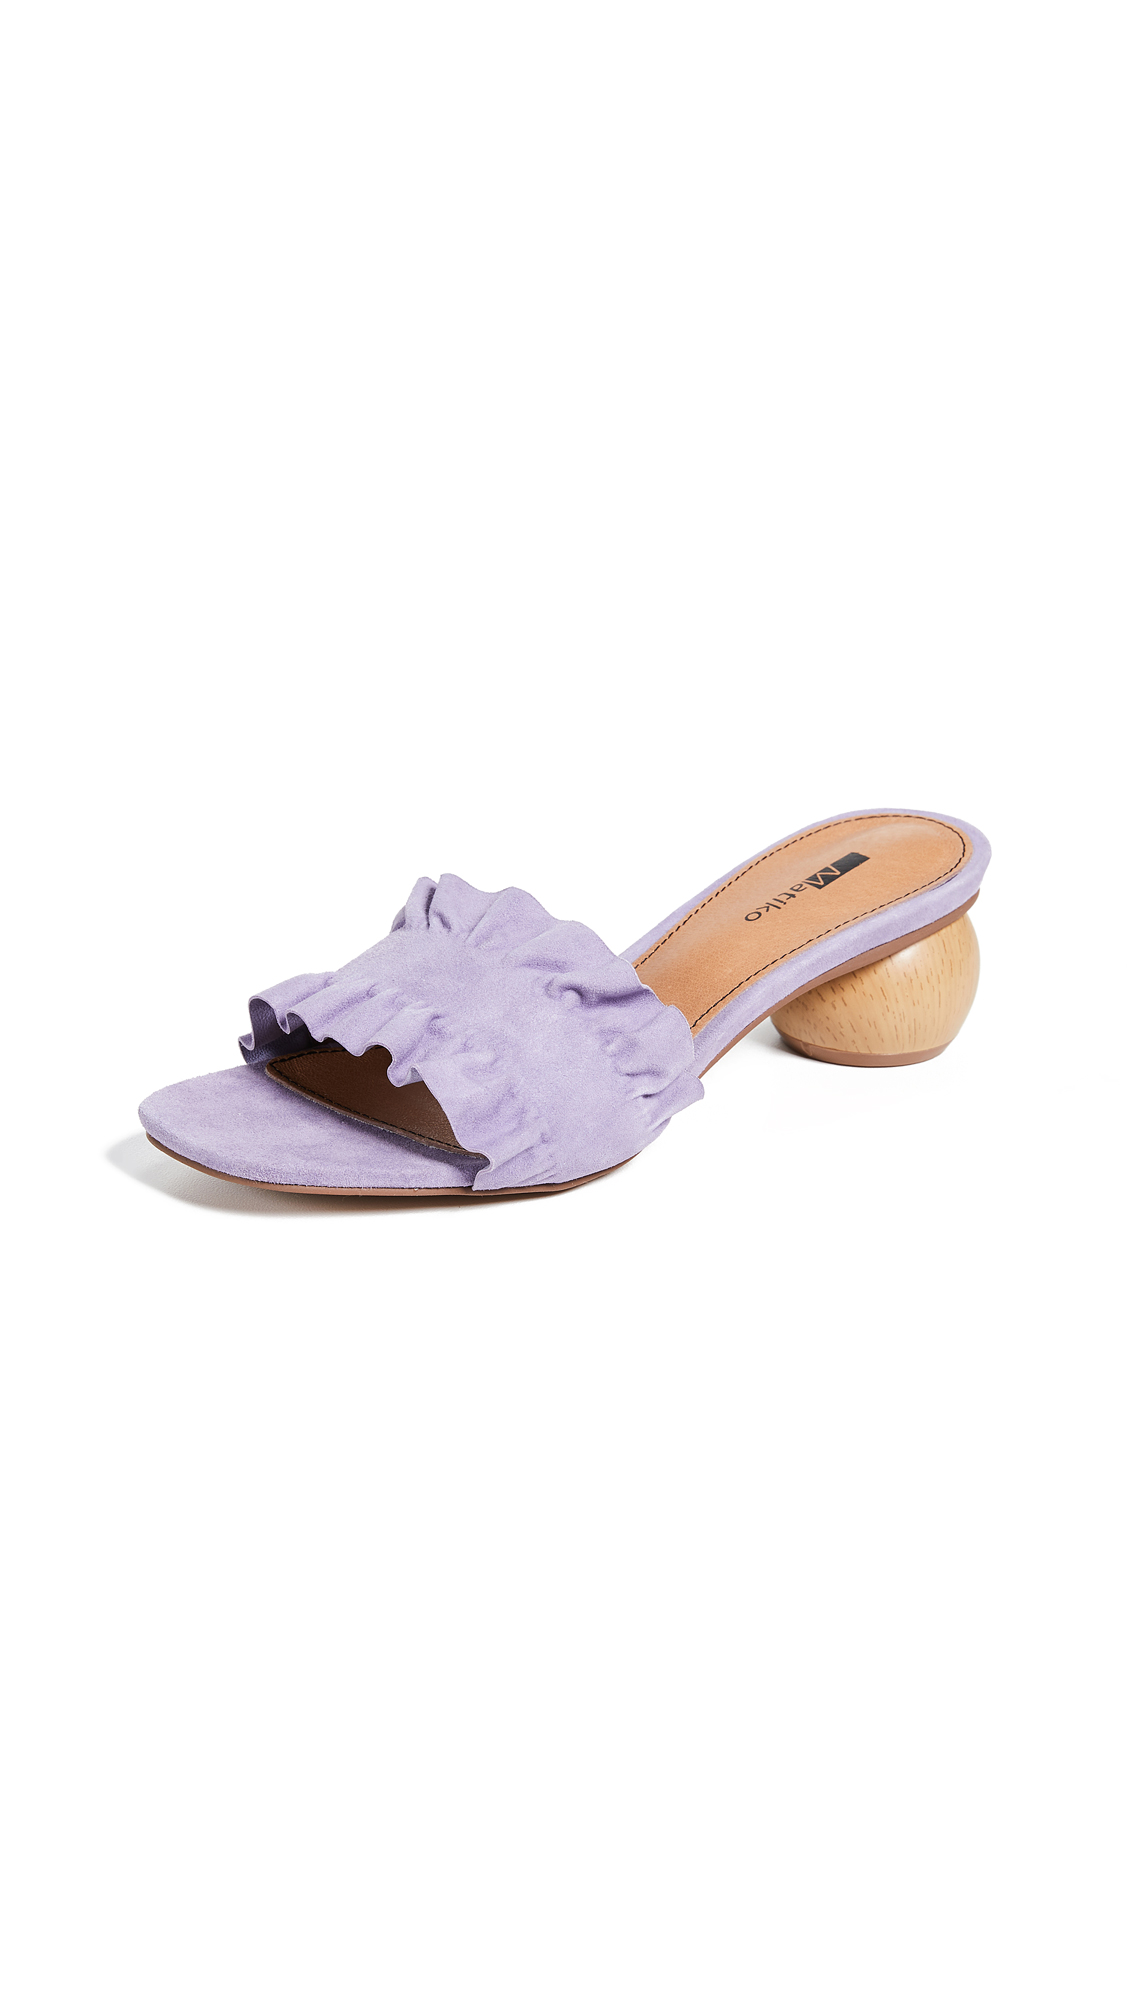 Photo of Matiko Madeline Slides - buy Matiko shoes